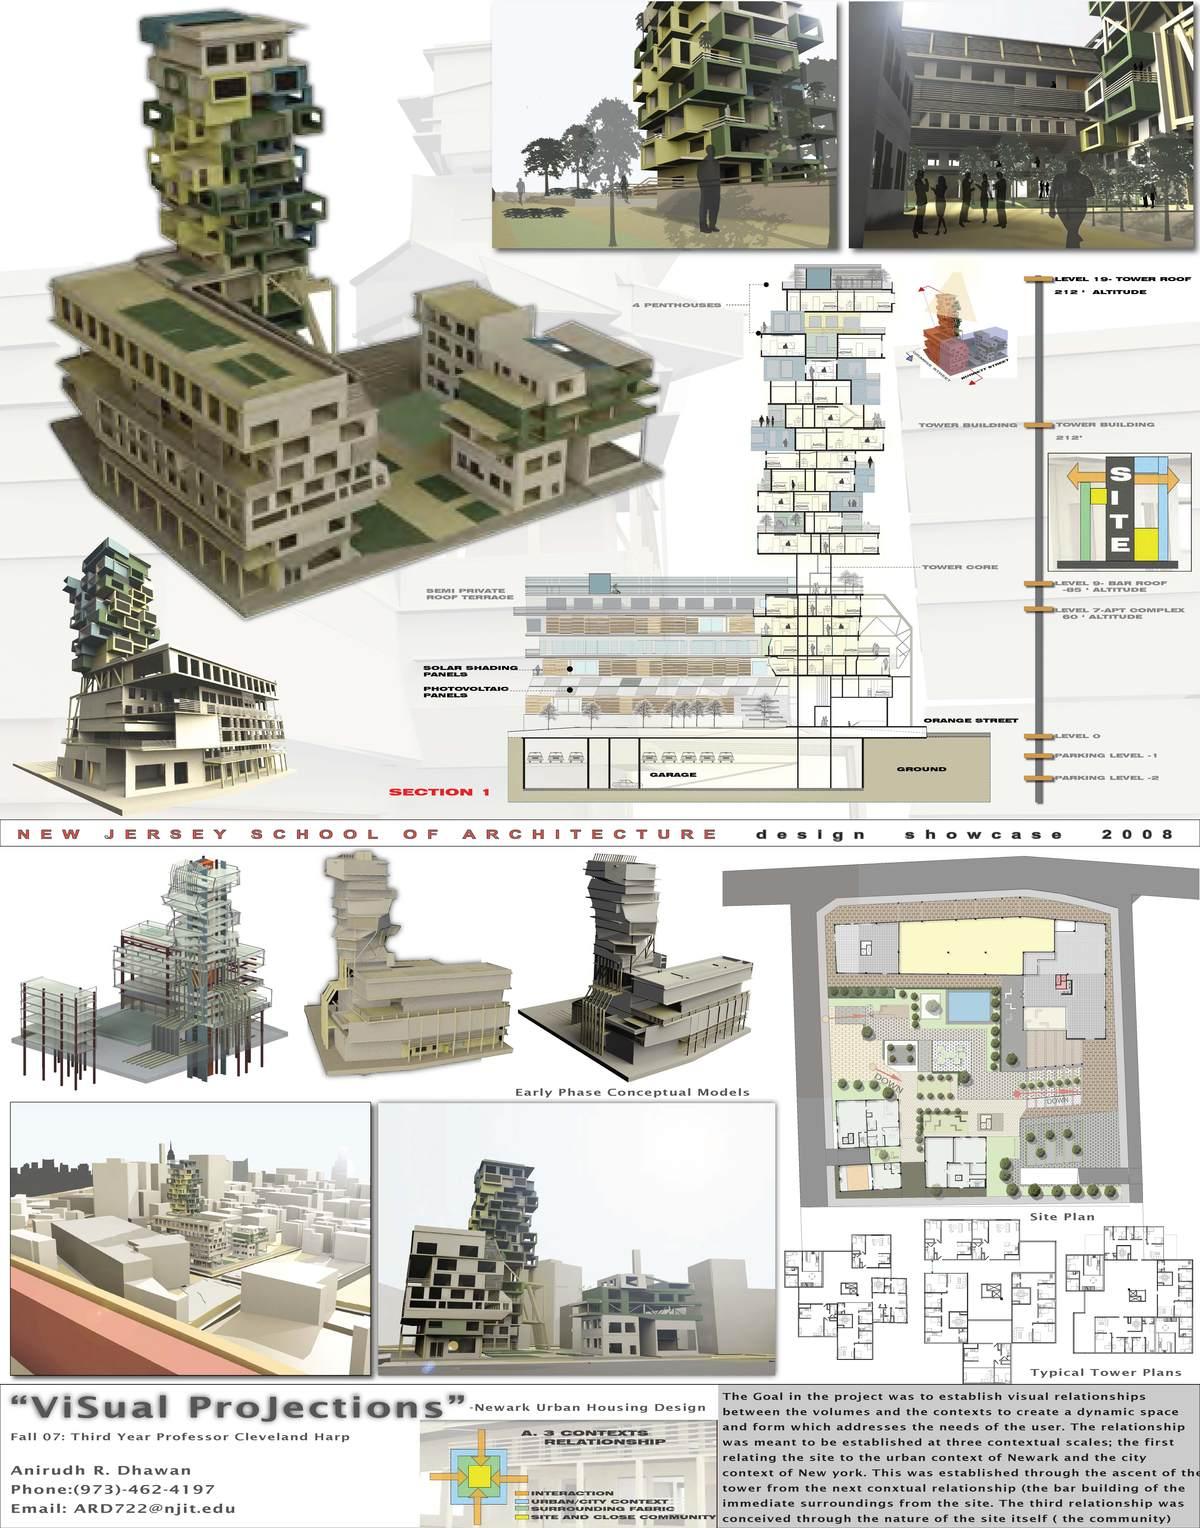 2008 NJIT Design Showcase Publication Panel